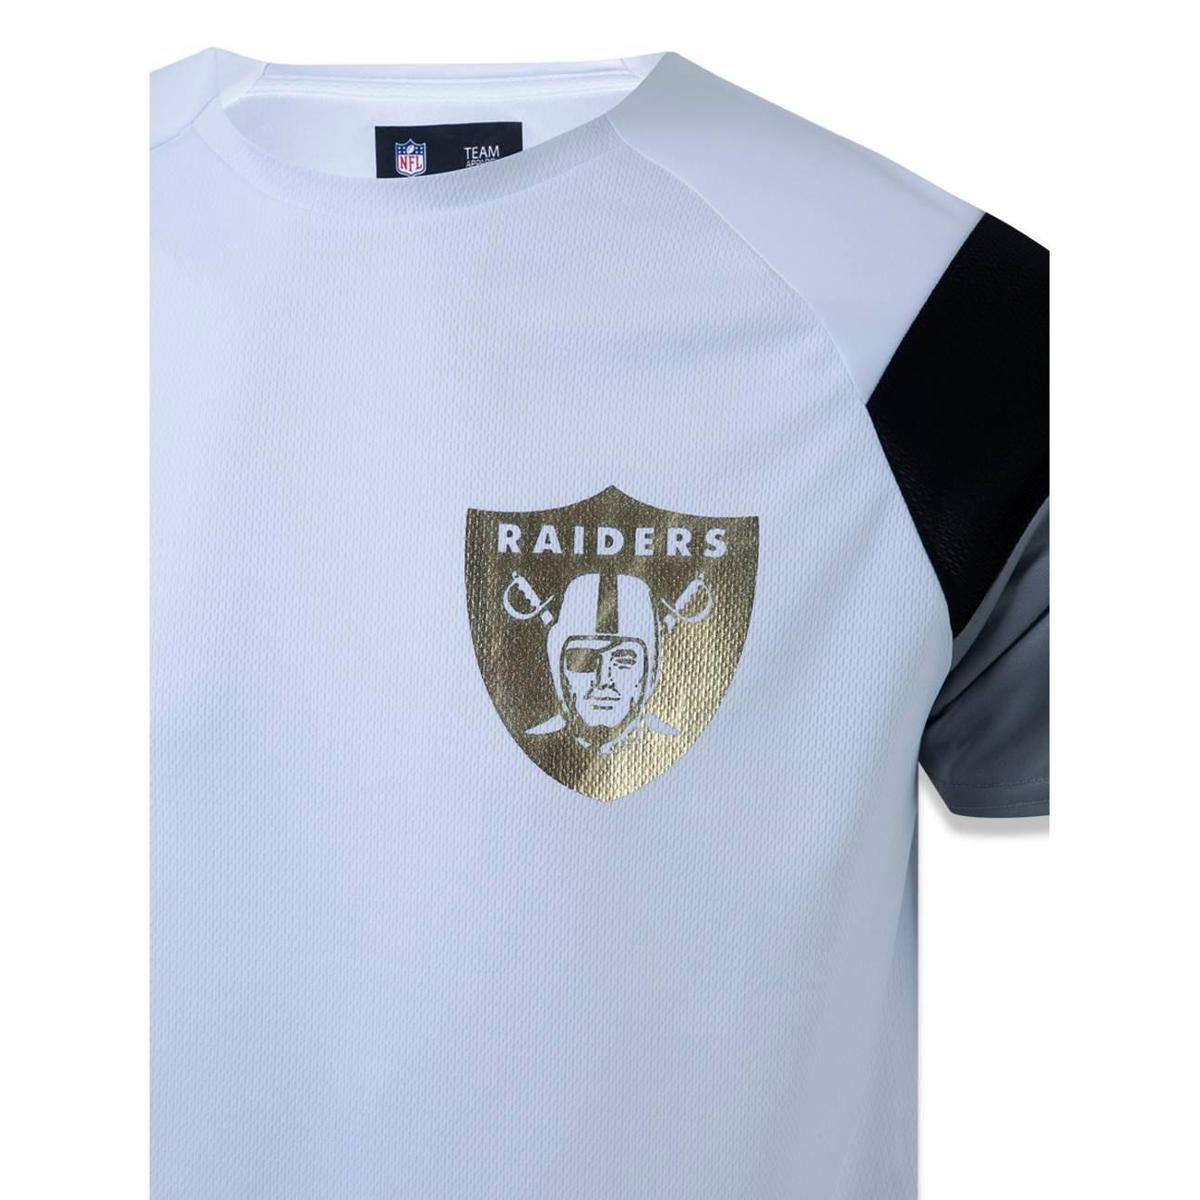 b4a82ae9d4 Camiseta Oakland Raiders NFL New Era Masculina - Compre Agora